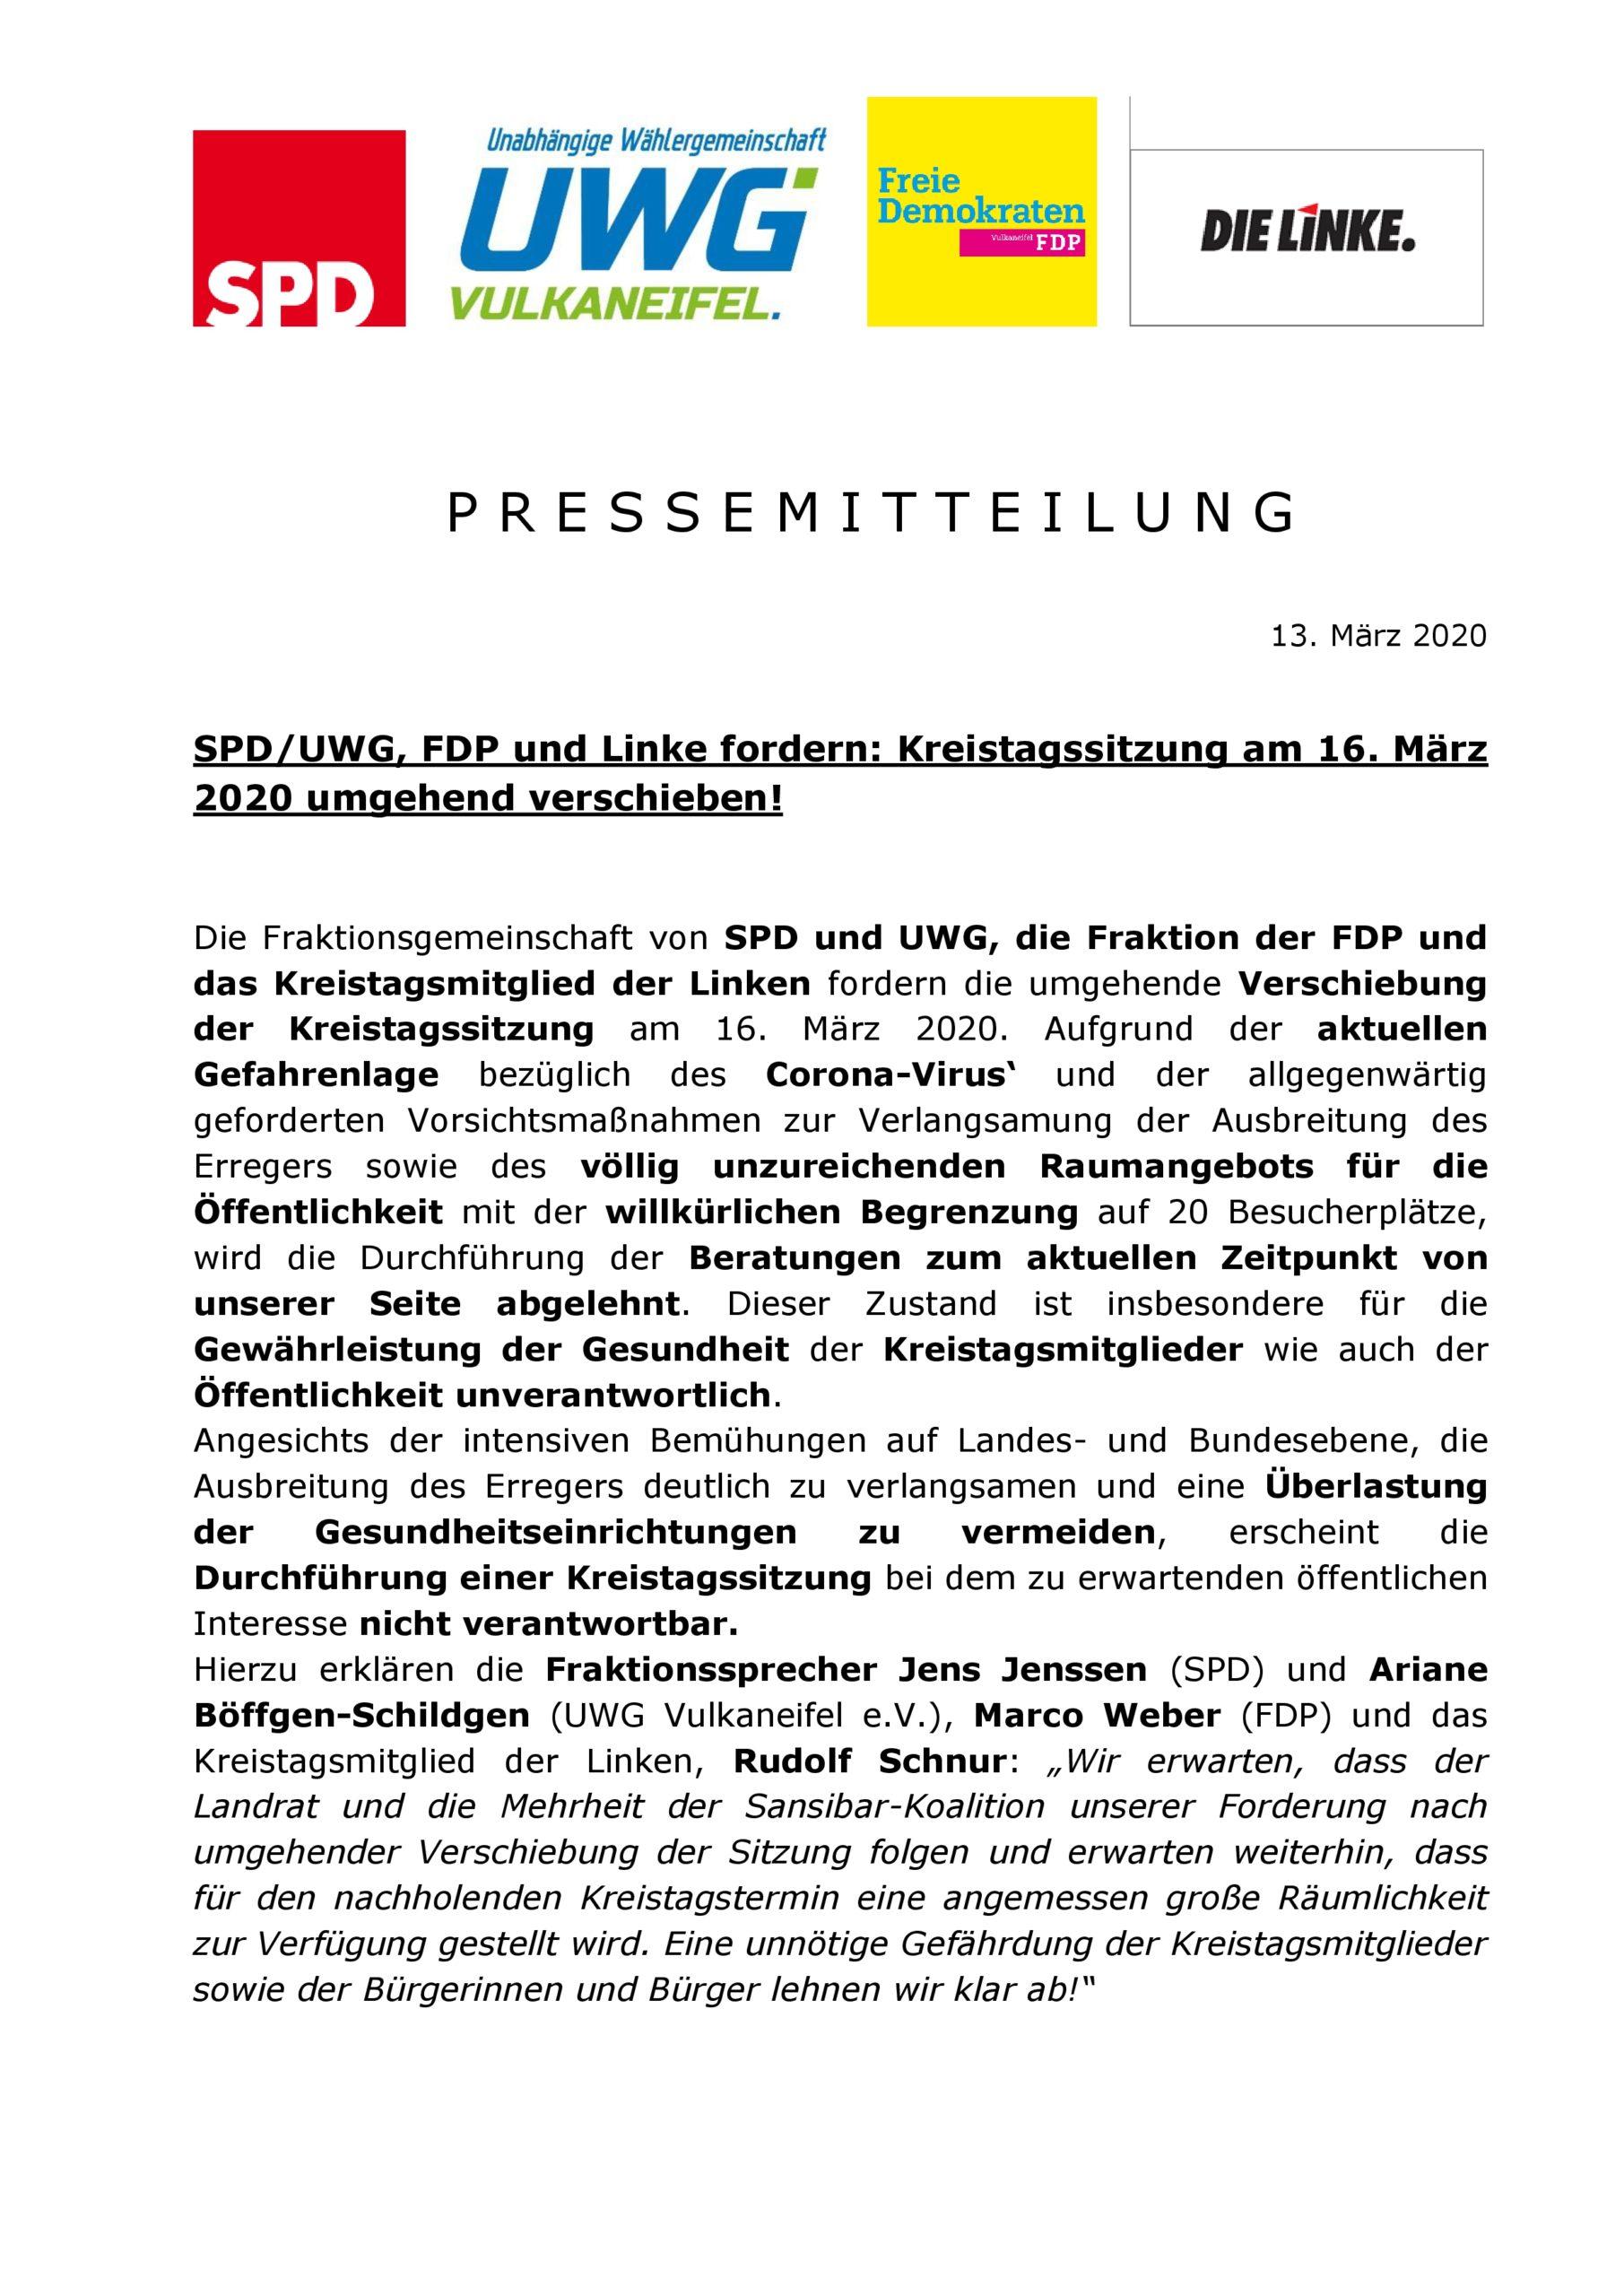 PM_Kreistagssitzung verschieben_2020_03_13_final